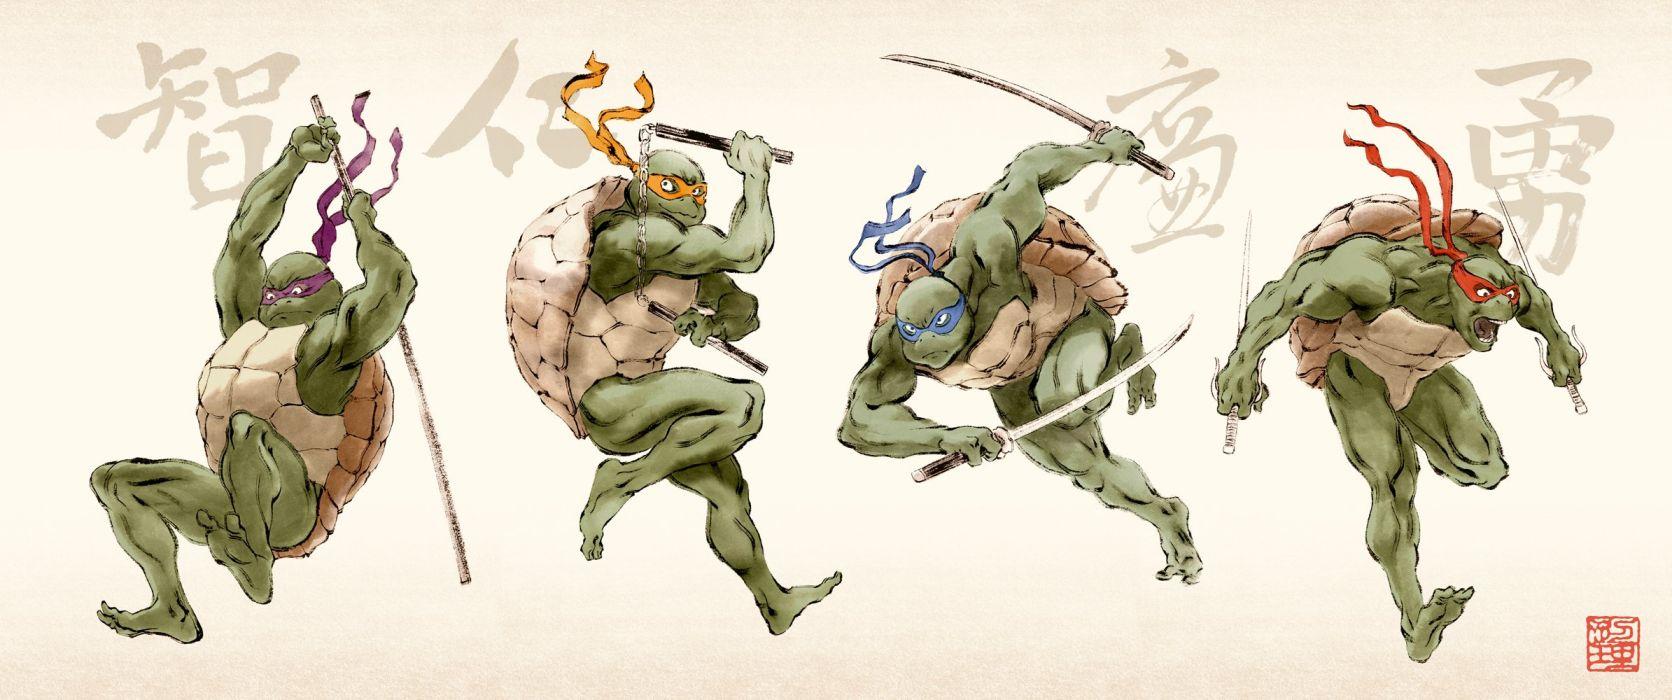 TEENAGE MUTANT NINJA TURTLES fantasy sci-fi adventure warrior animation action fighting tmnt wallpaper